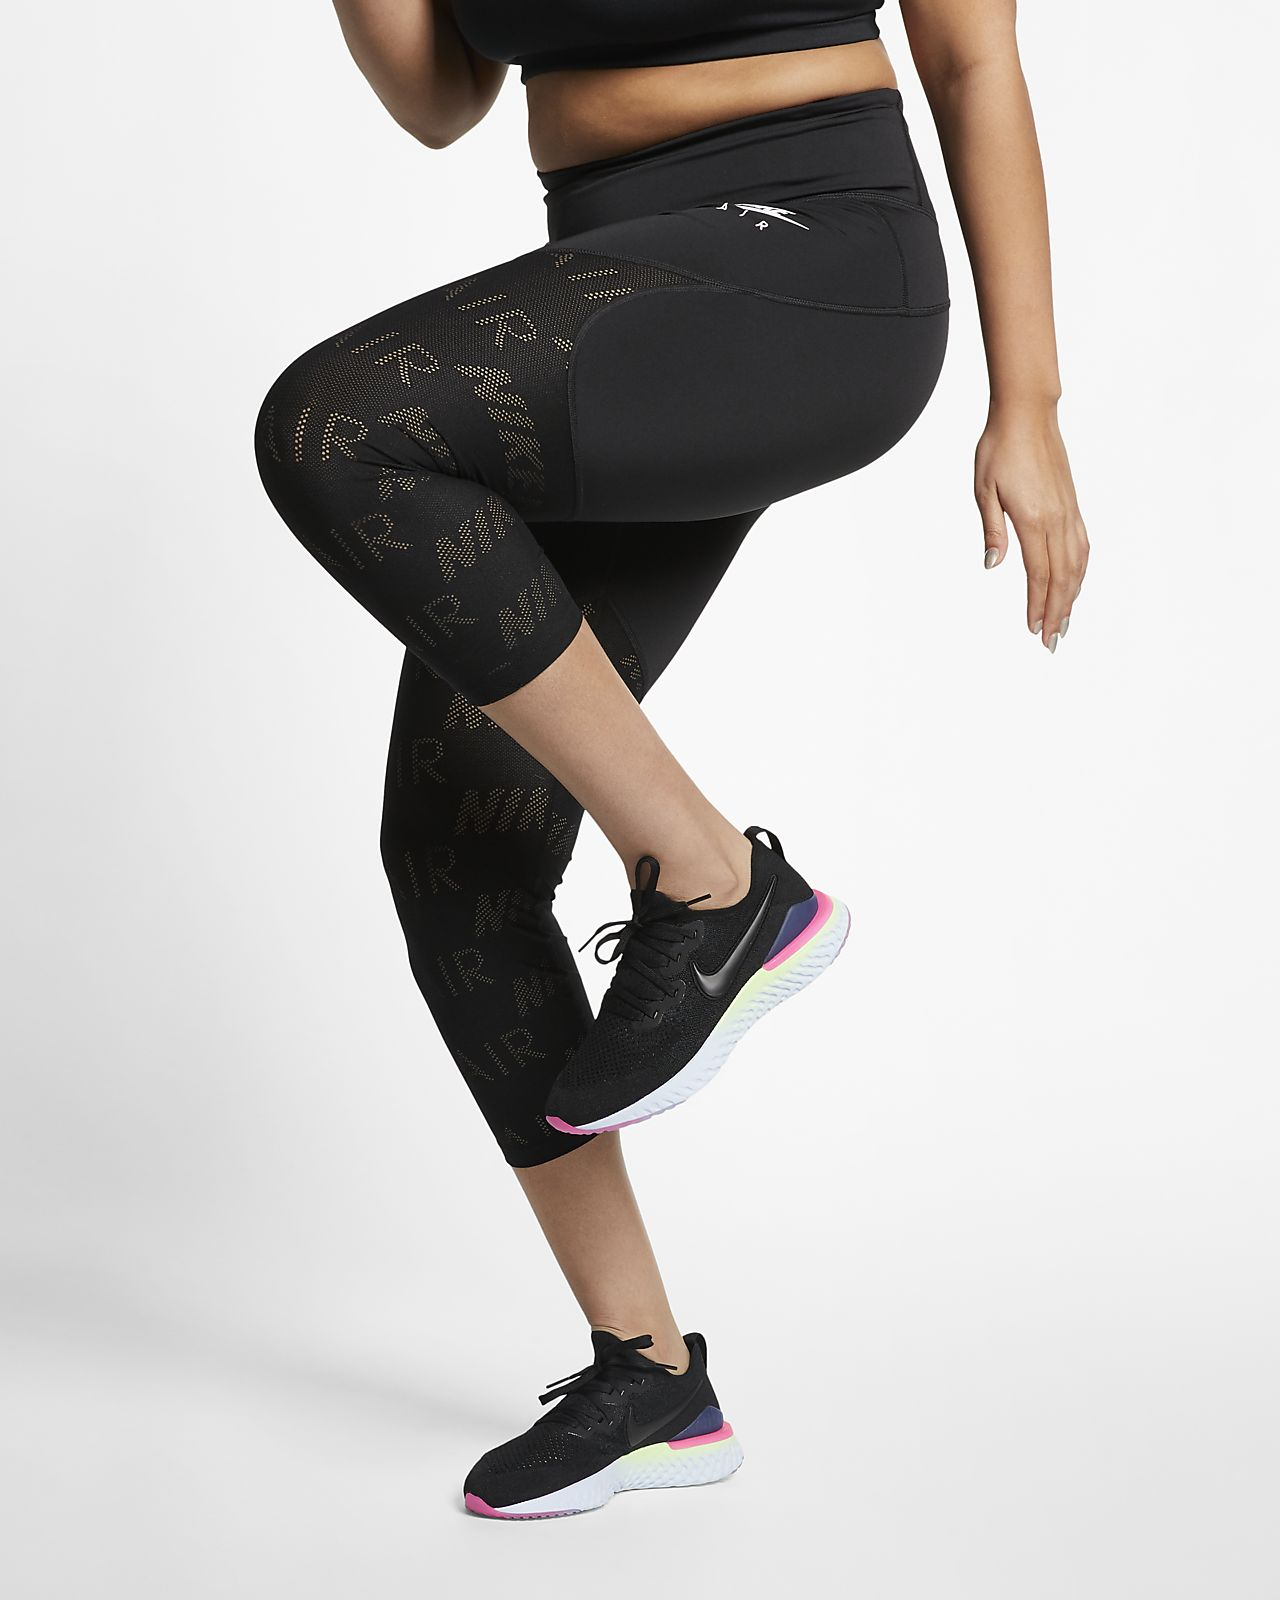 Pescadores de running para mujer (talla grande) Nike Air Fast